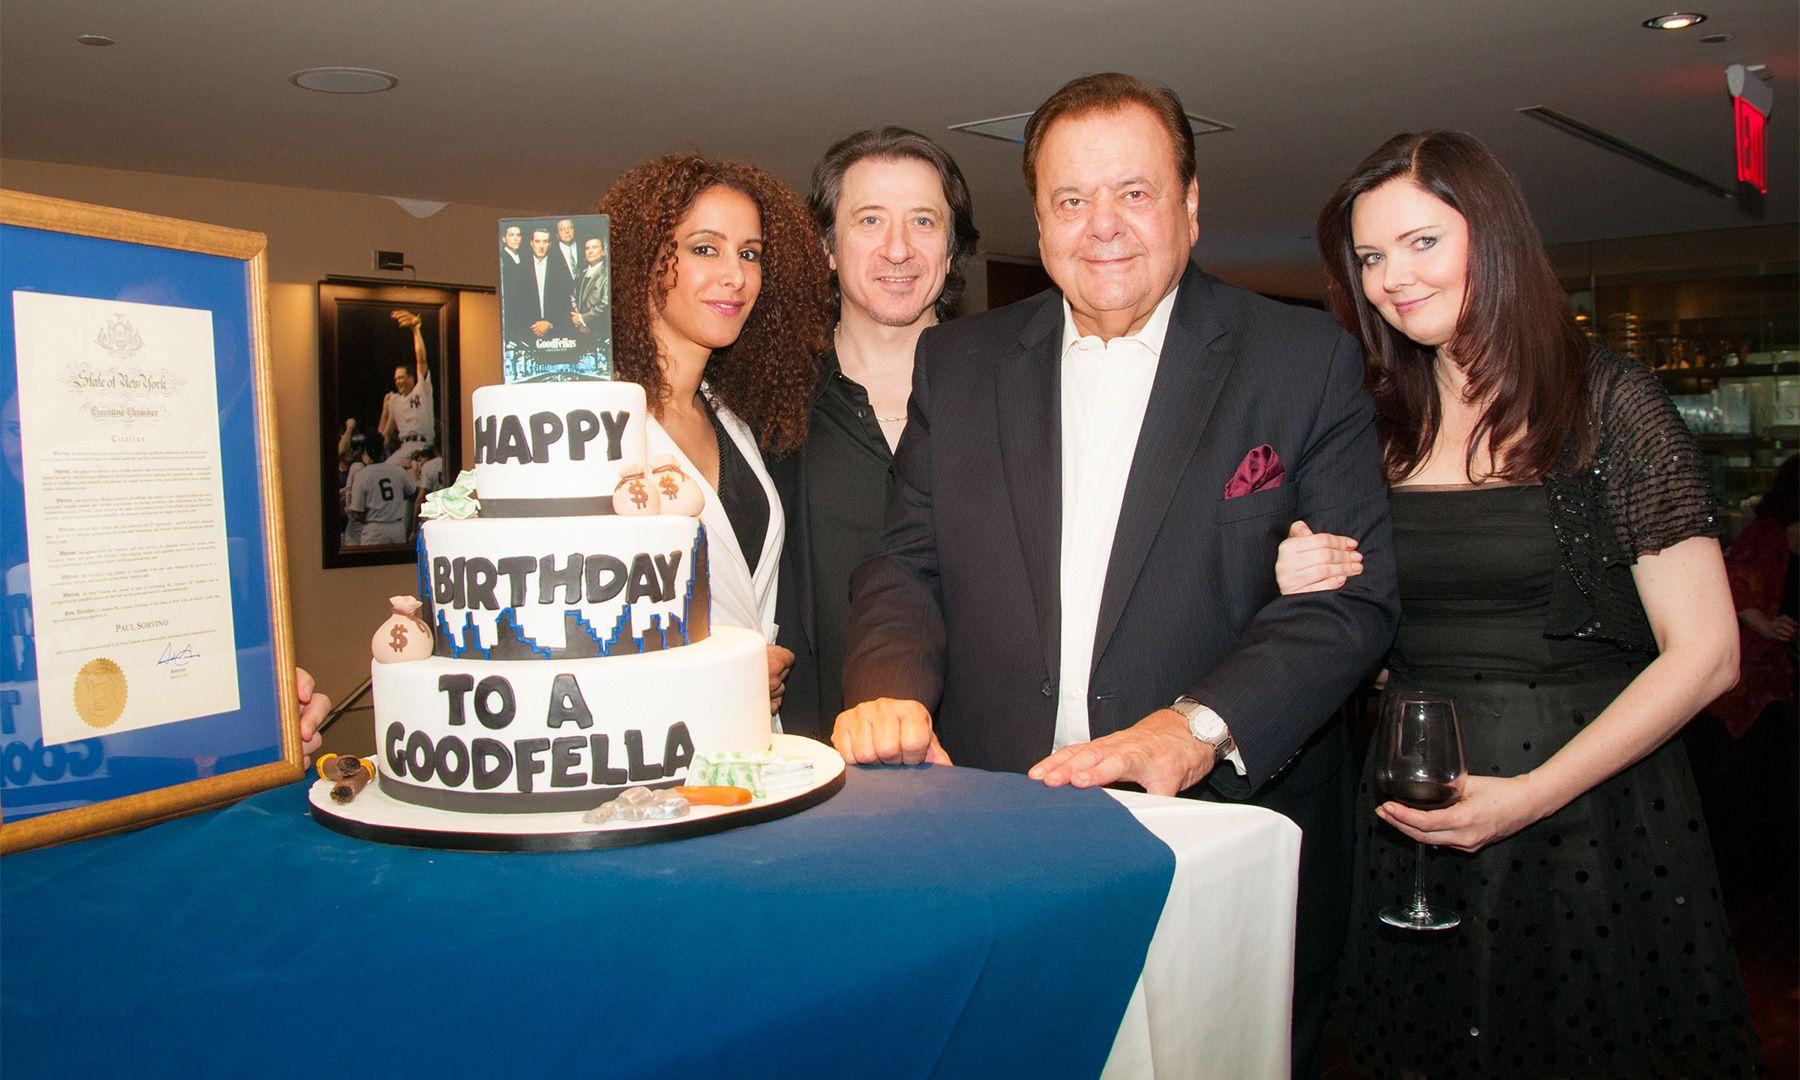 Pictures Inside Paul Sorvino S 76th Birthday Celebration At Nyy Steak In New York City Dujour 76th Birthday Birthday Birthday Celebration